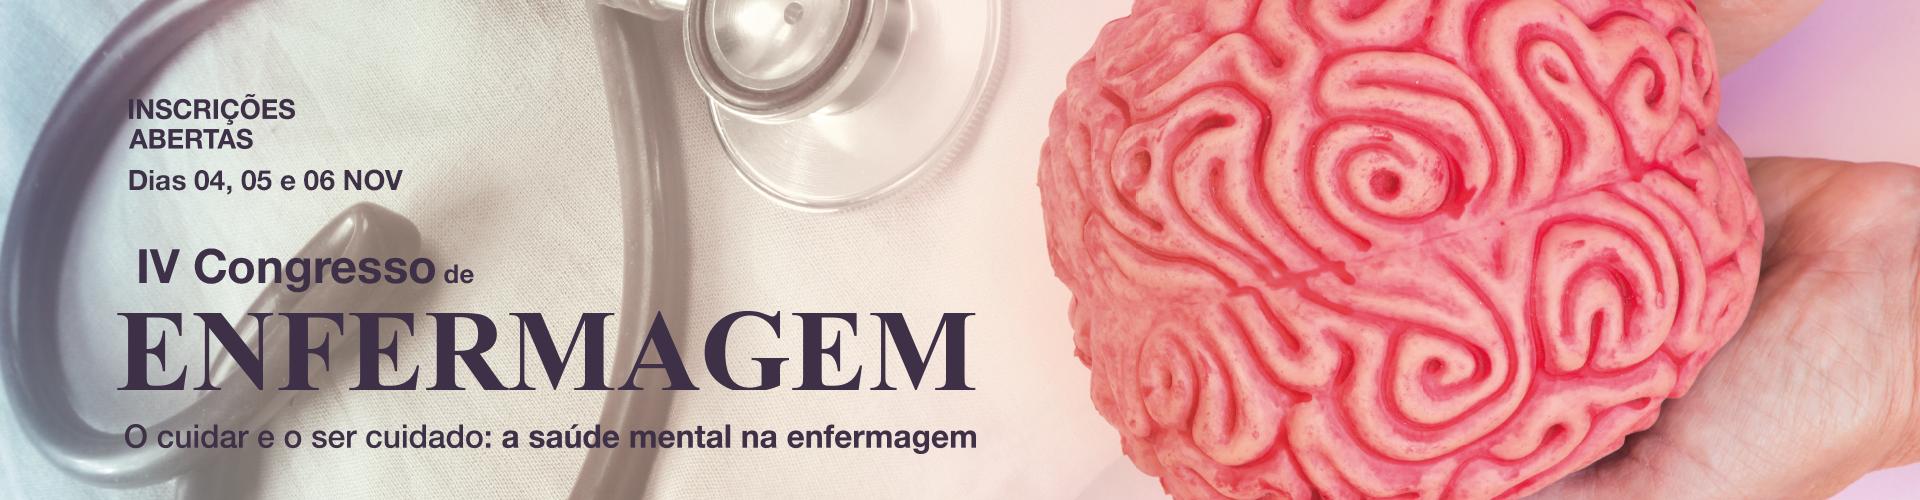 Banner-pag-Congresso-de-Enfermagem-2019